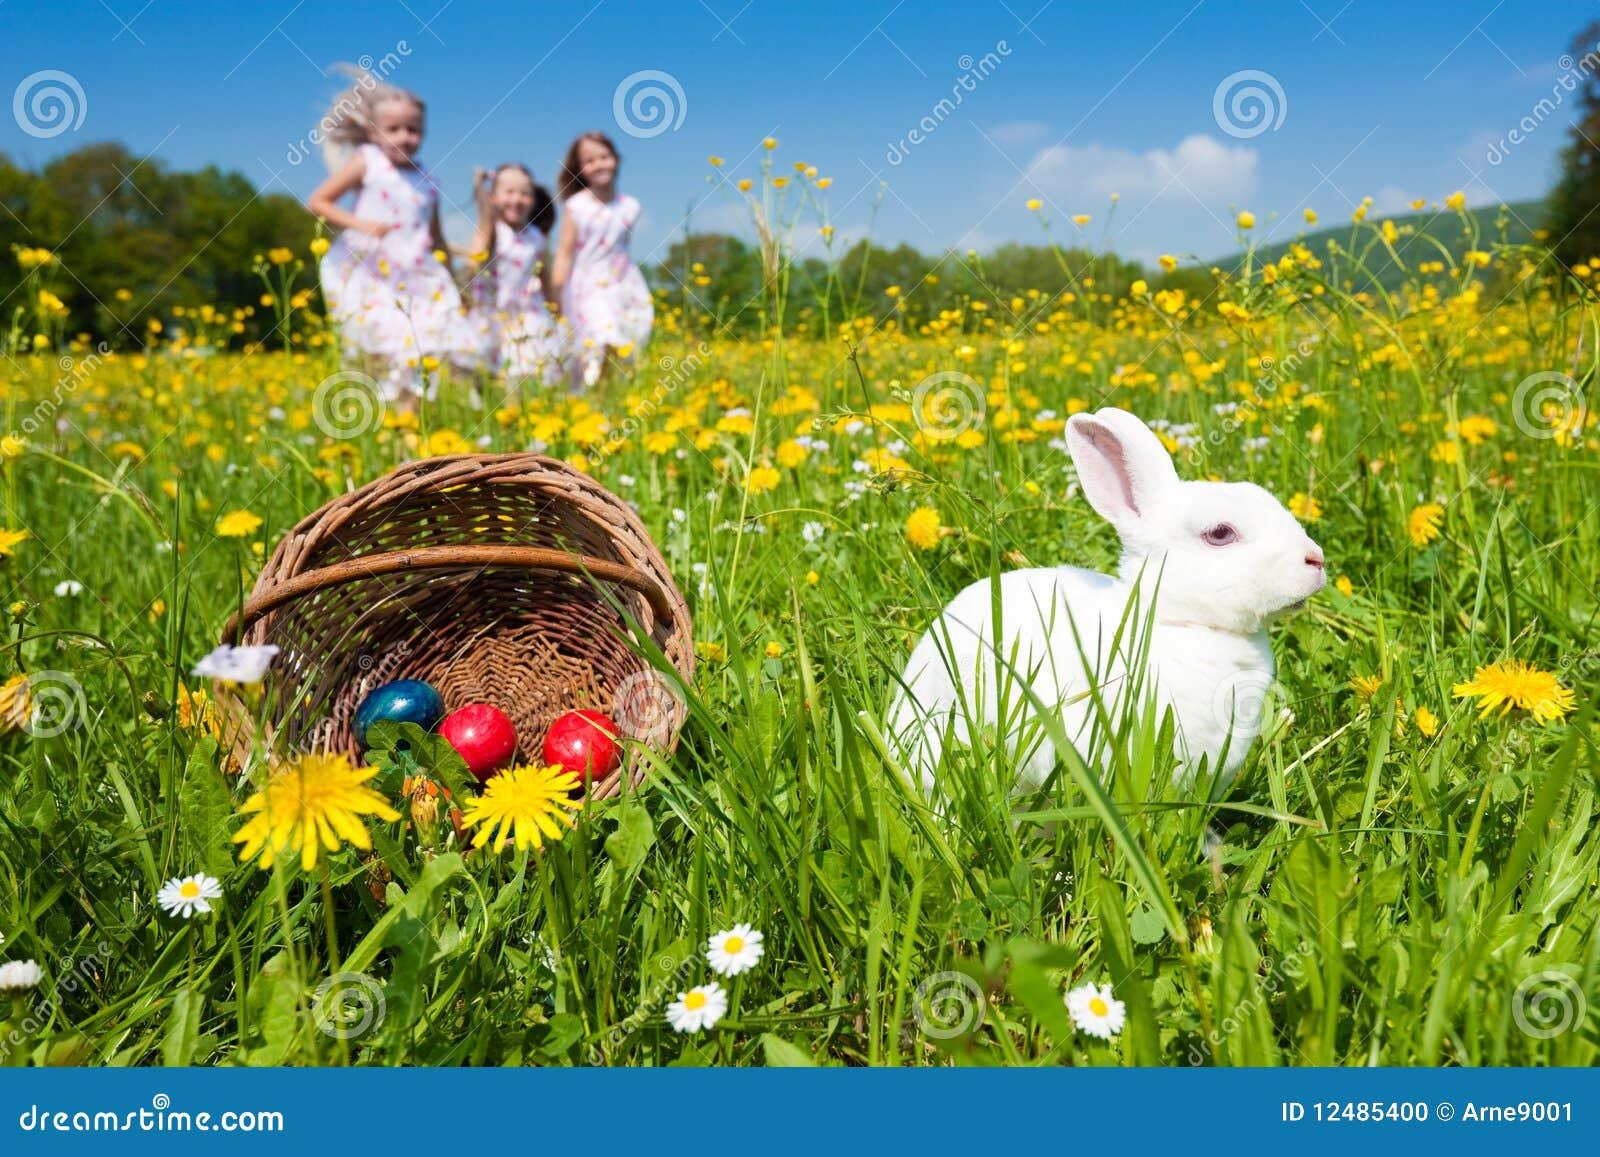 Lapin de Pâques observant l oeuf chasser